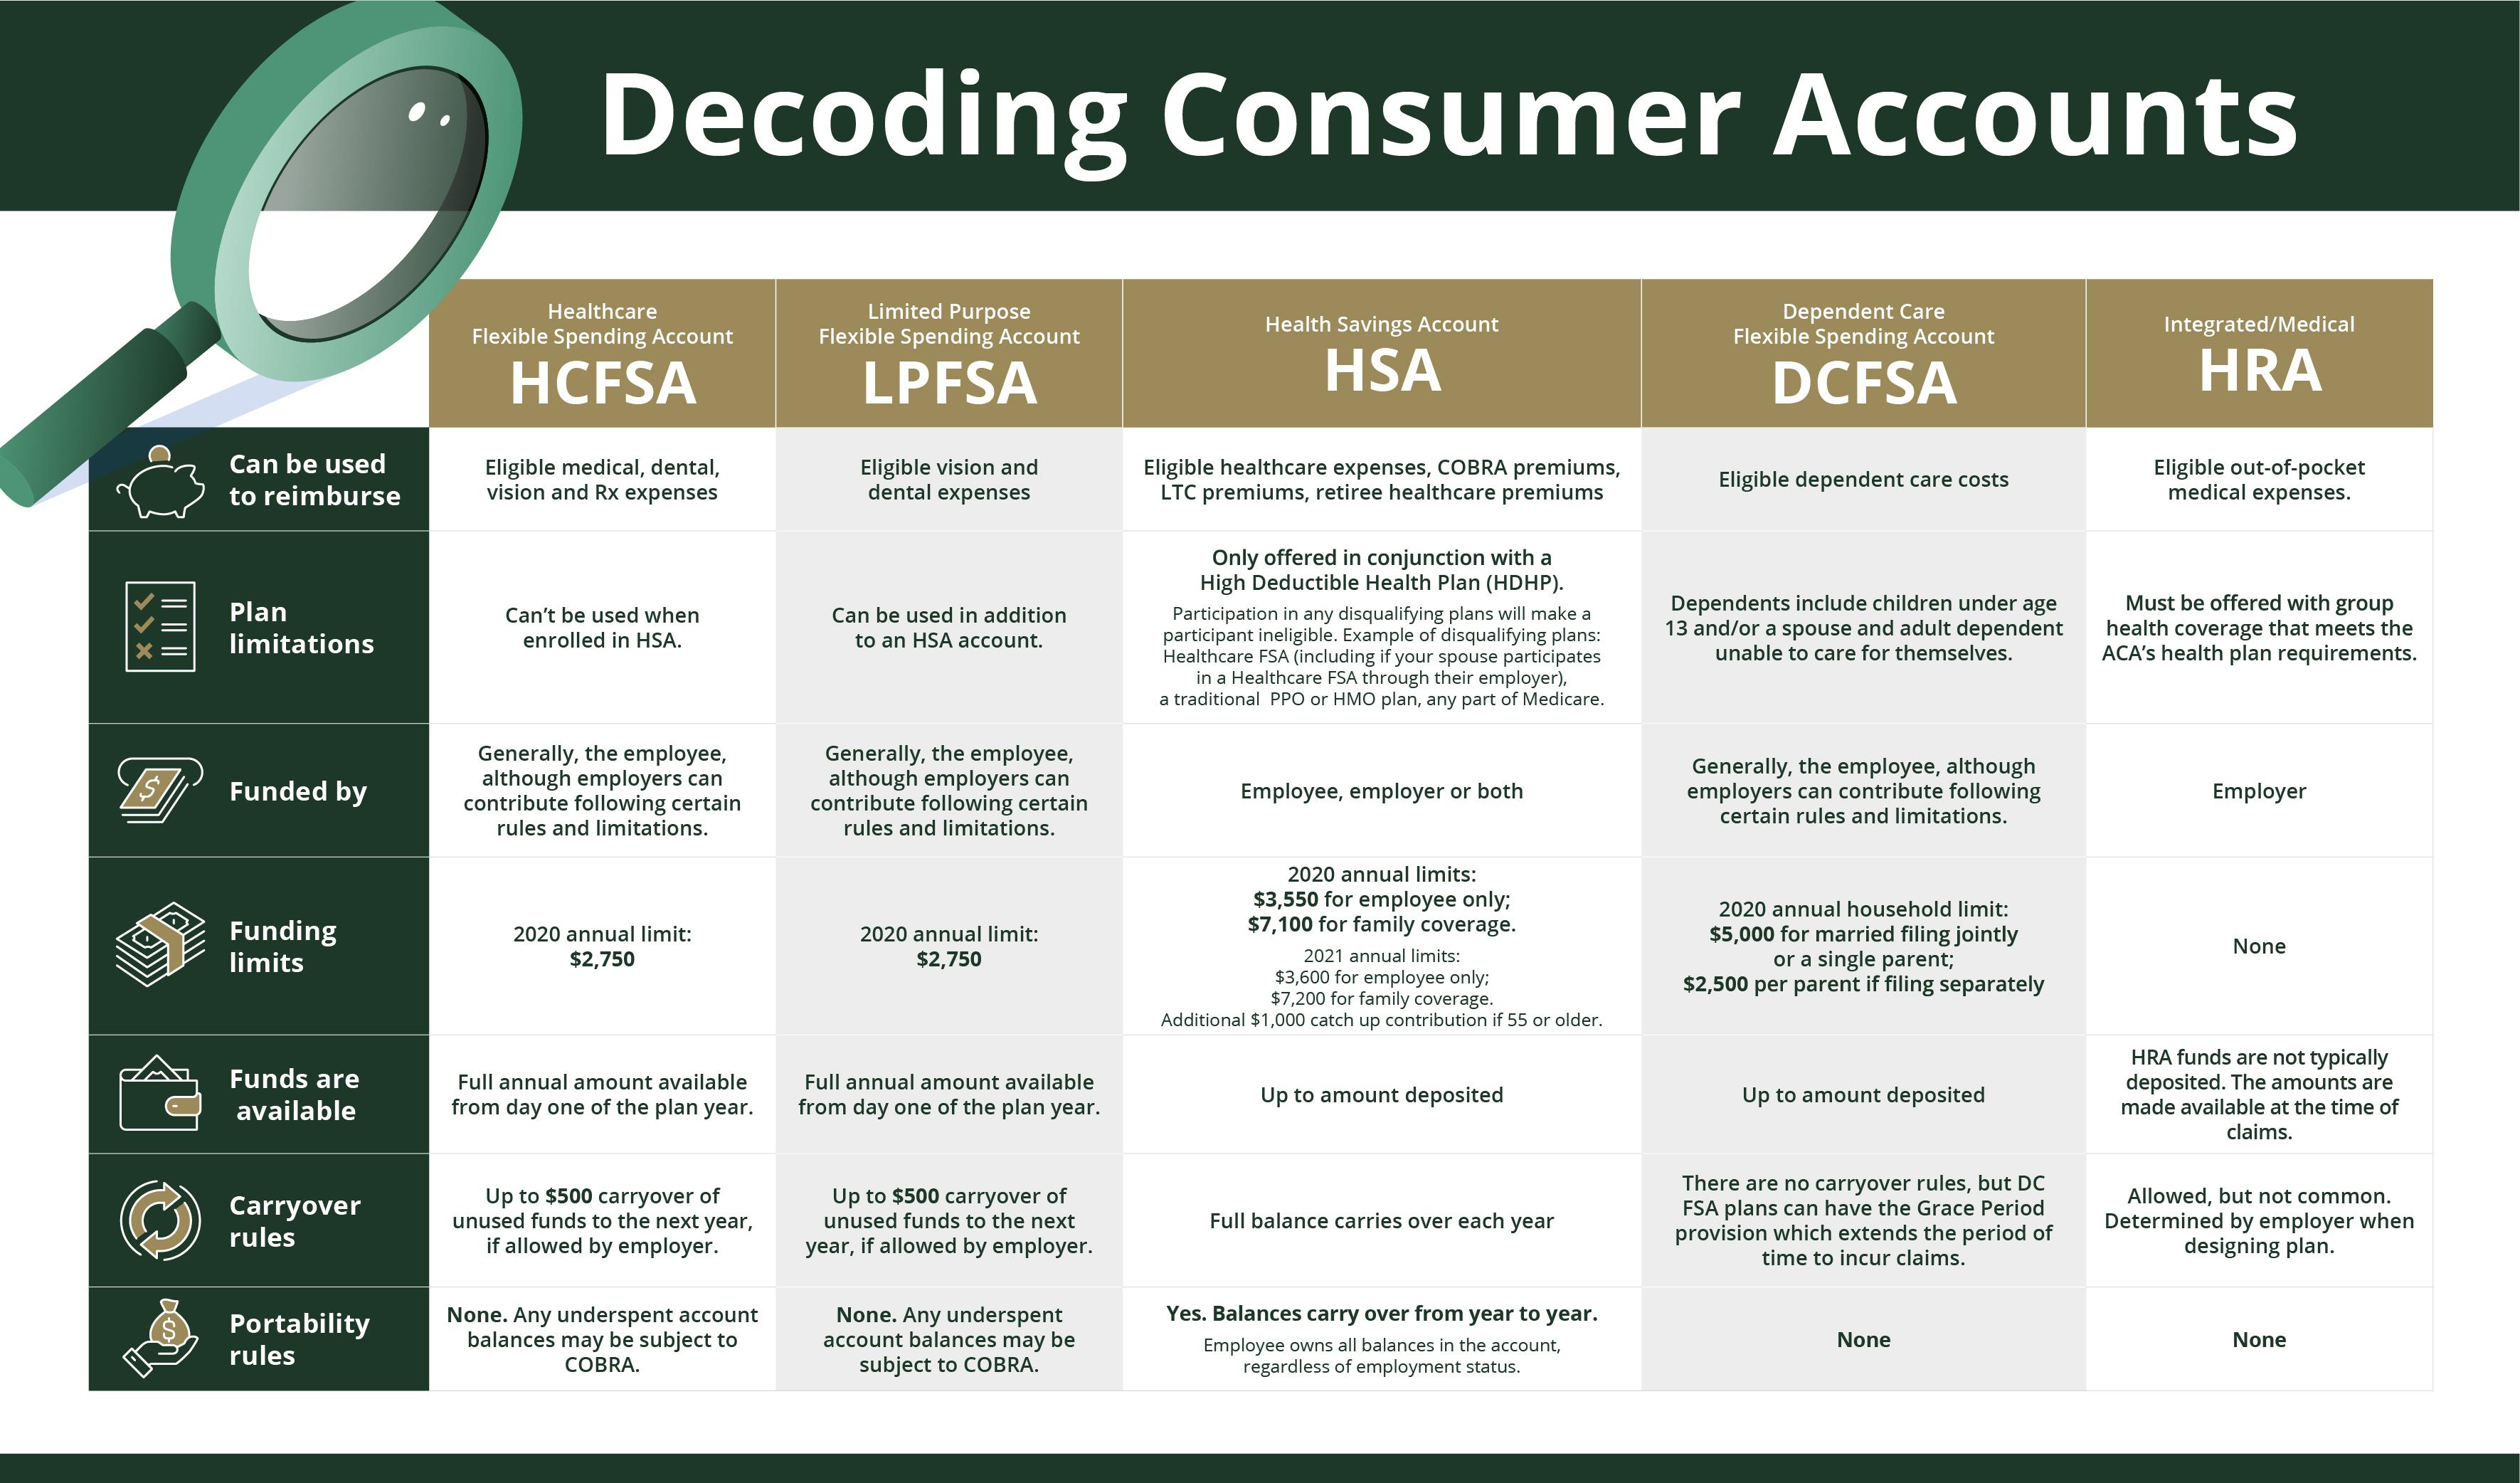 Decoding Consumer Accounts Comparison Chart